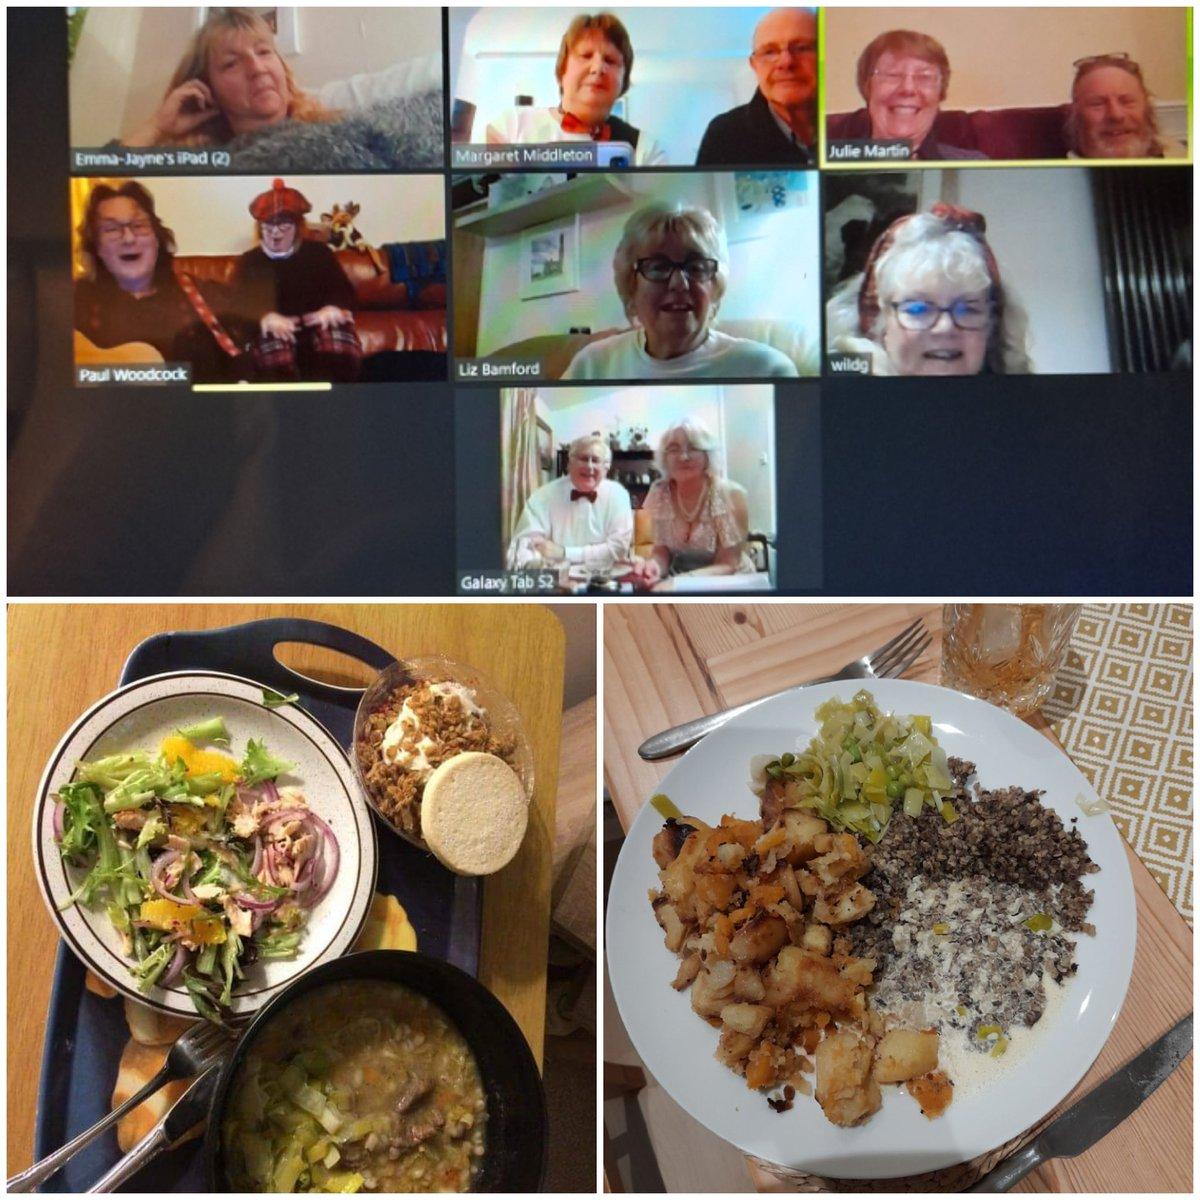 #VirtualBurnsNight in Devon (& Hampshire!) #goodfriends #donaldwheresyourtroosers https://t.co/ZdGPrWnPYz